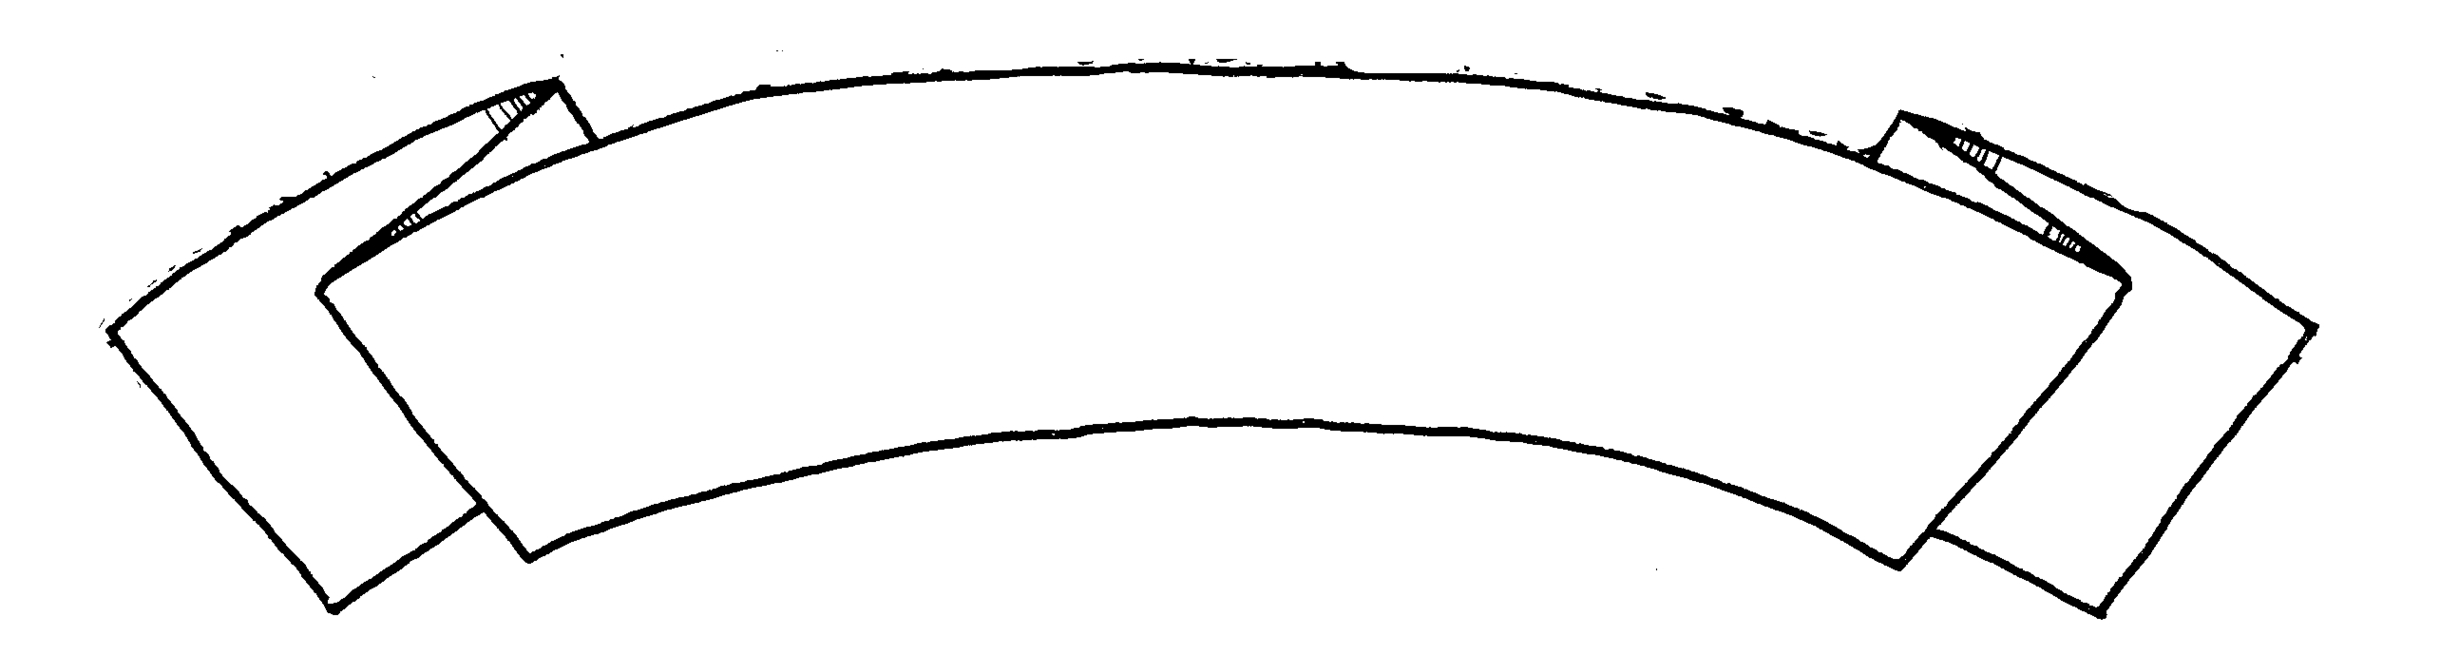 Similiar Scroll Banner Template Keywords.